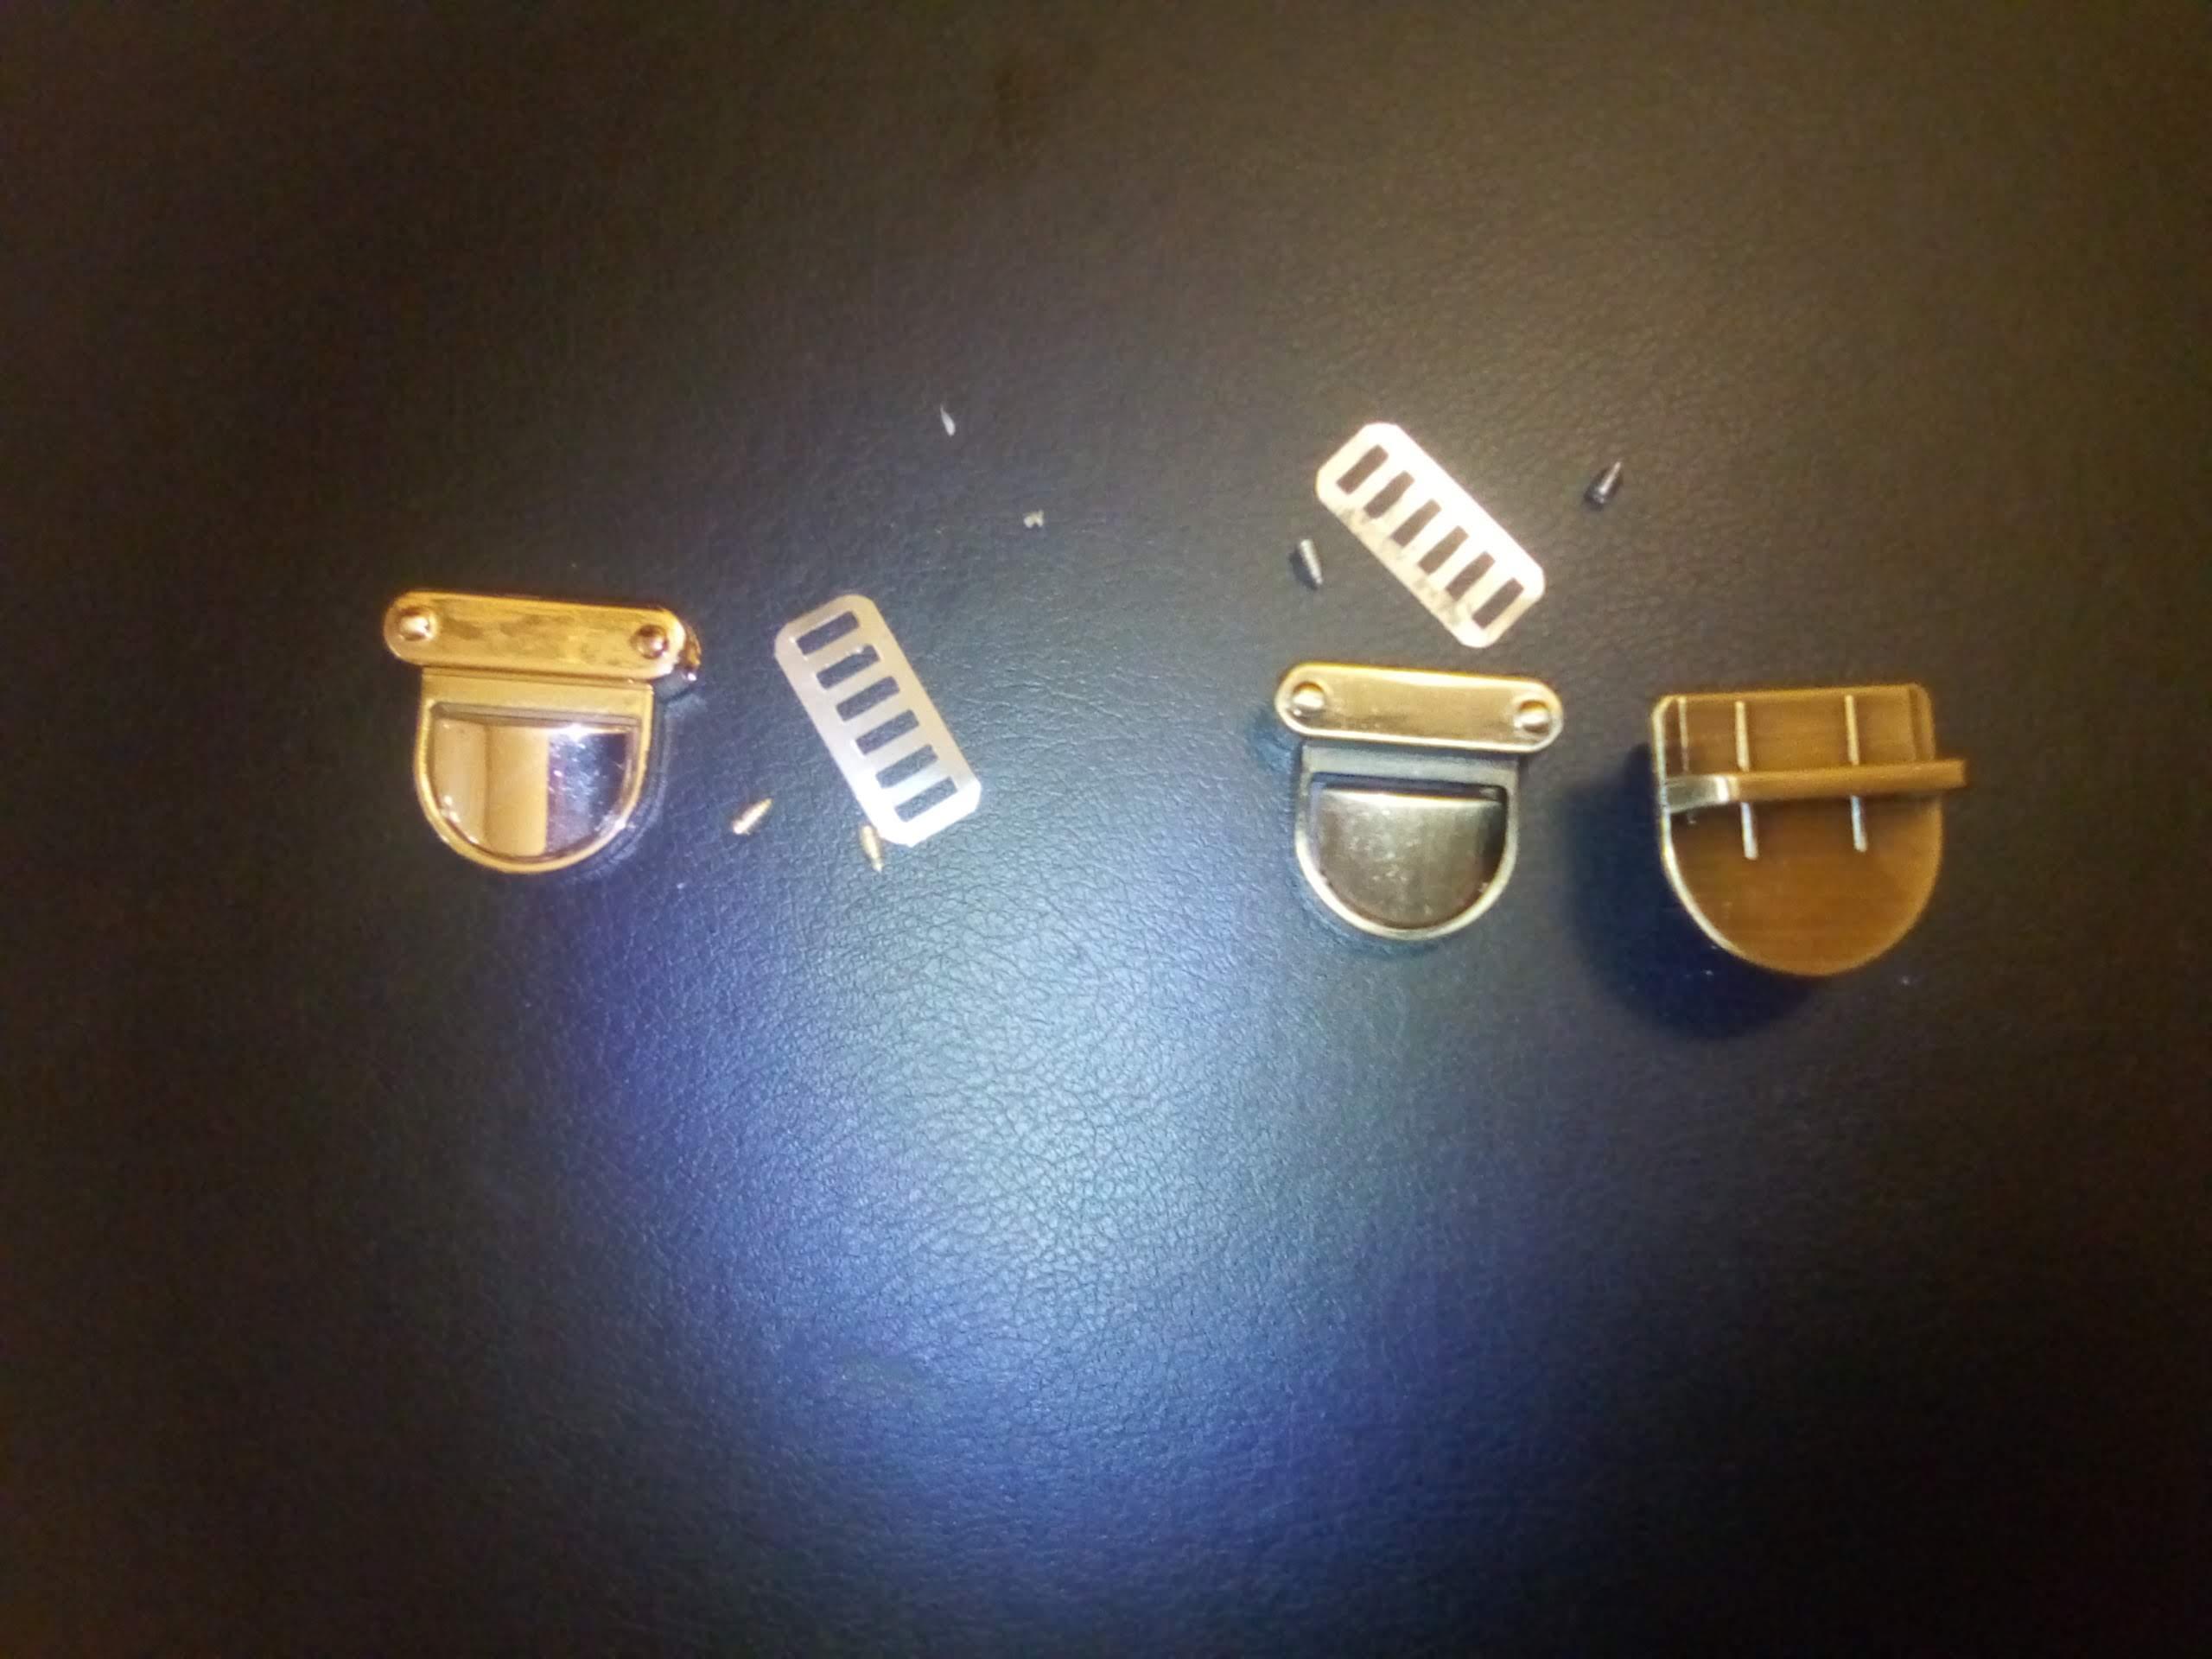 Nieuwste Metalen Sluiting Turn Lock Twist Lock voor DIY Handtas Tas Purse Hardware Sluiting photo review